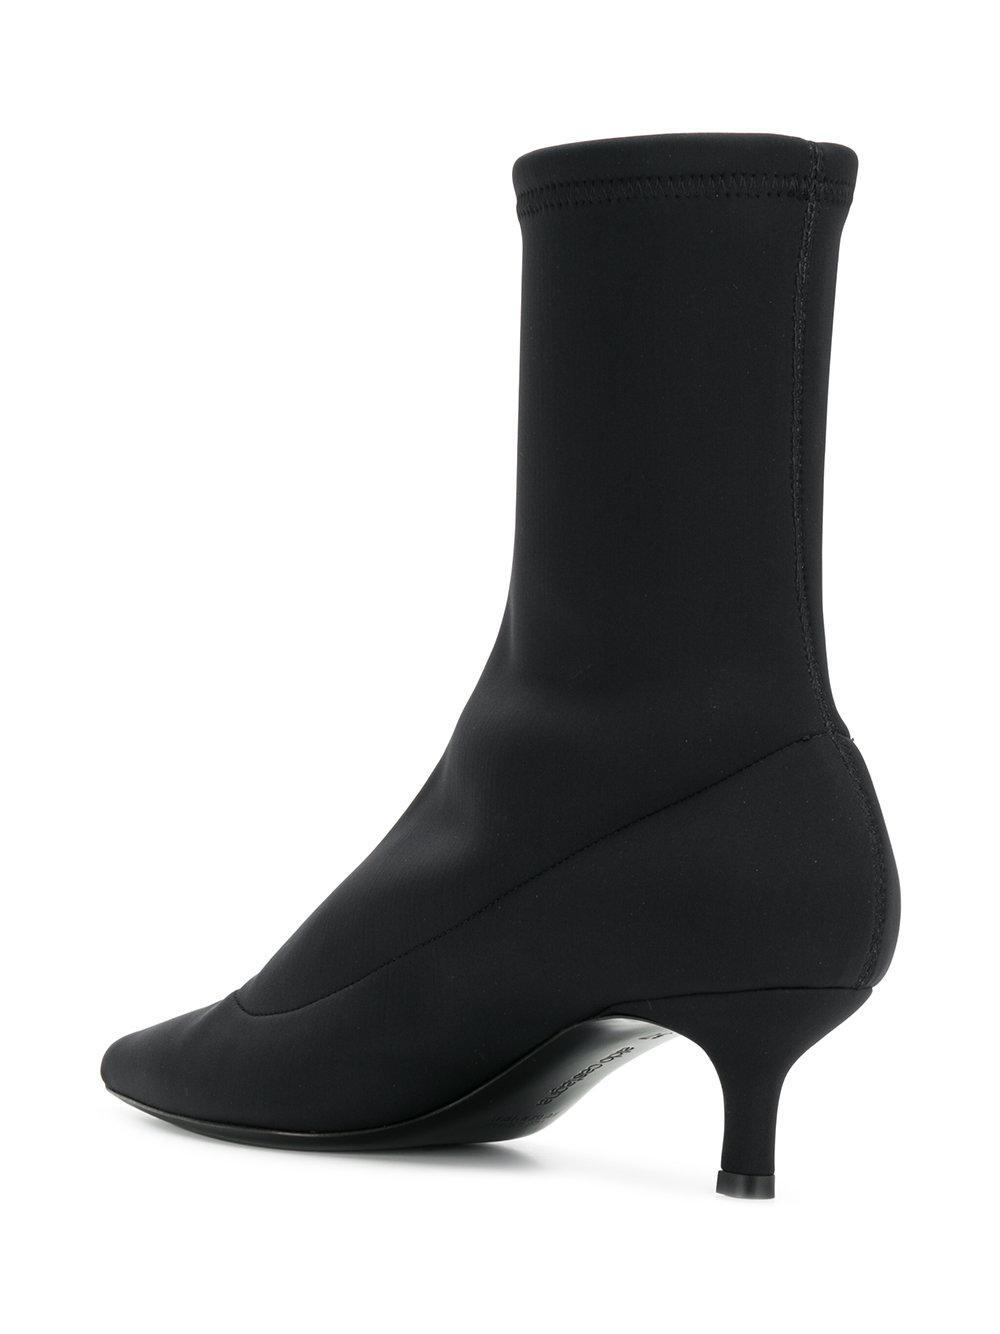 Aldo Castagna Leather Kitten Heel Sock Boots in Black